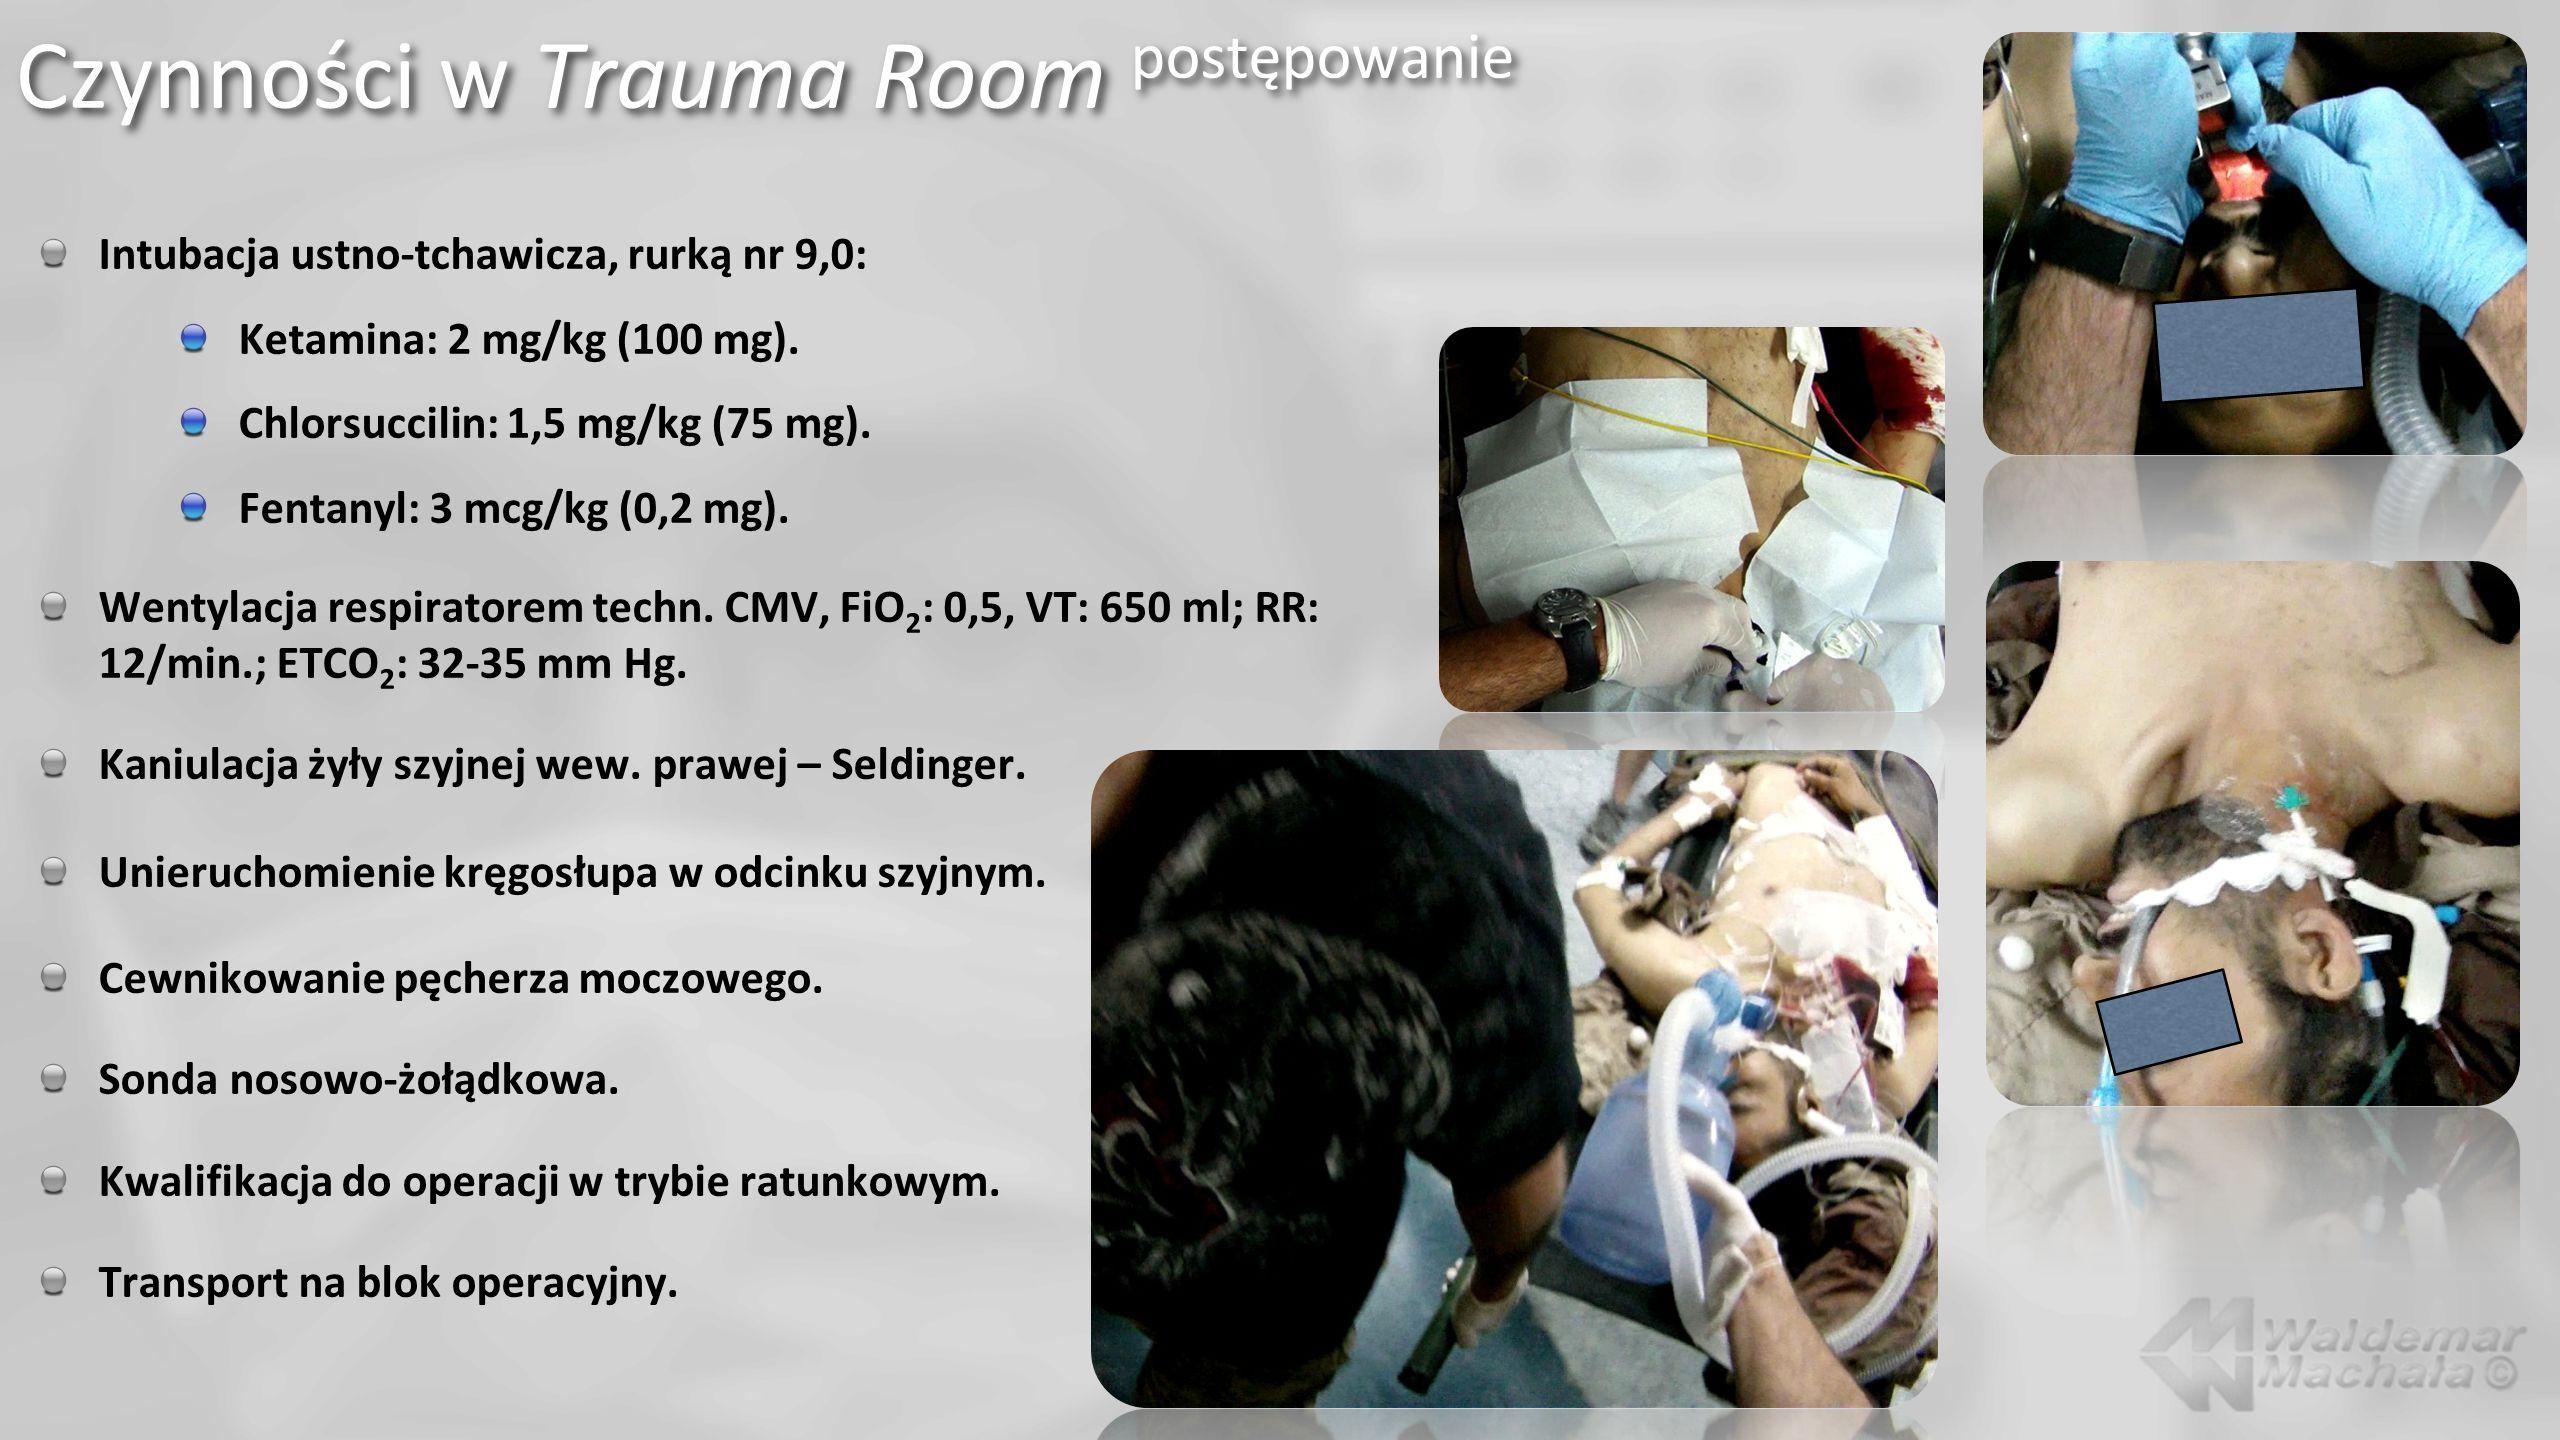 Intubacja ustno-tchawicza, rurką nr 9,0: Ketamina: 2 mg/kg (100 mg). Chlorsuccilin: 1,5 mg/kg (75 mg). Fentanyl: 3 mcg/kg (0,2 mg). Wentylacja respira